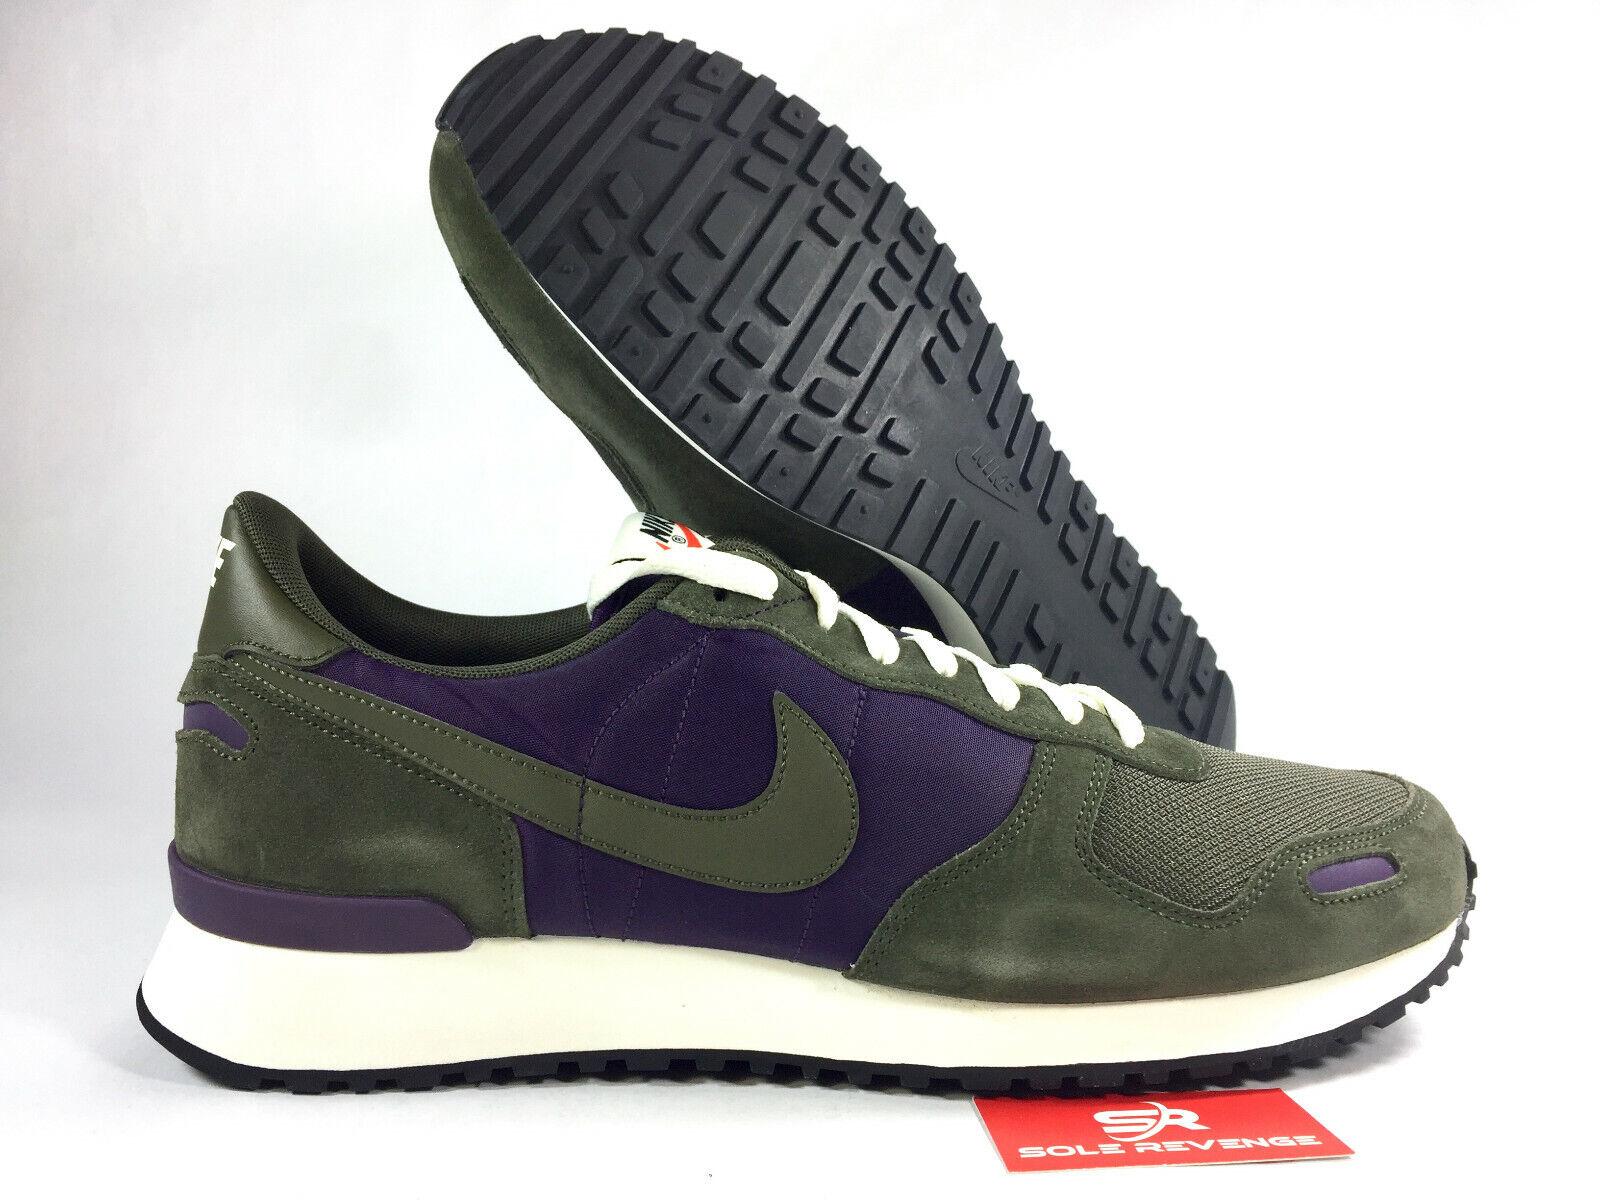 d271114a96f 12.5 Nike Air Max Vortex Vrtx Grand Purple Cargo Khaki Sail 903896-500 shoes  x1 ncvtxc5599-Athletic Shoes